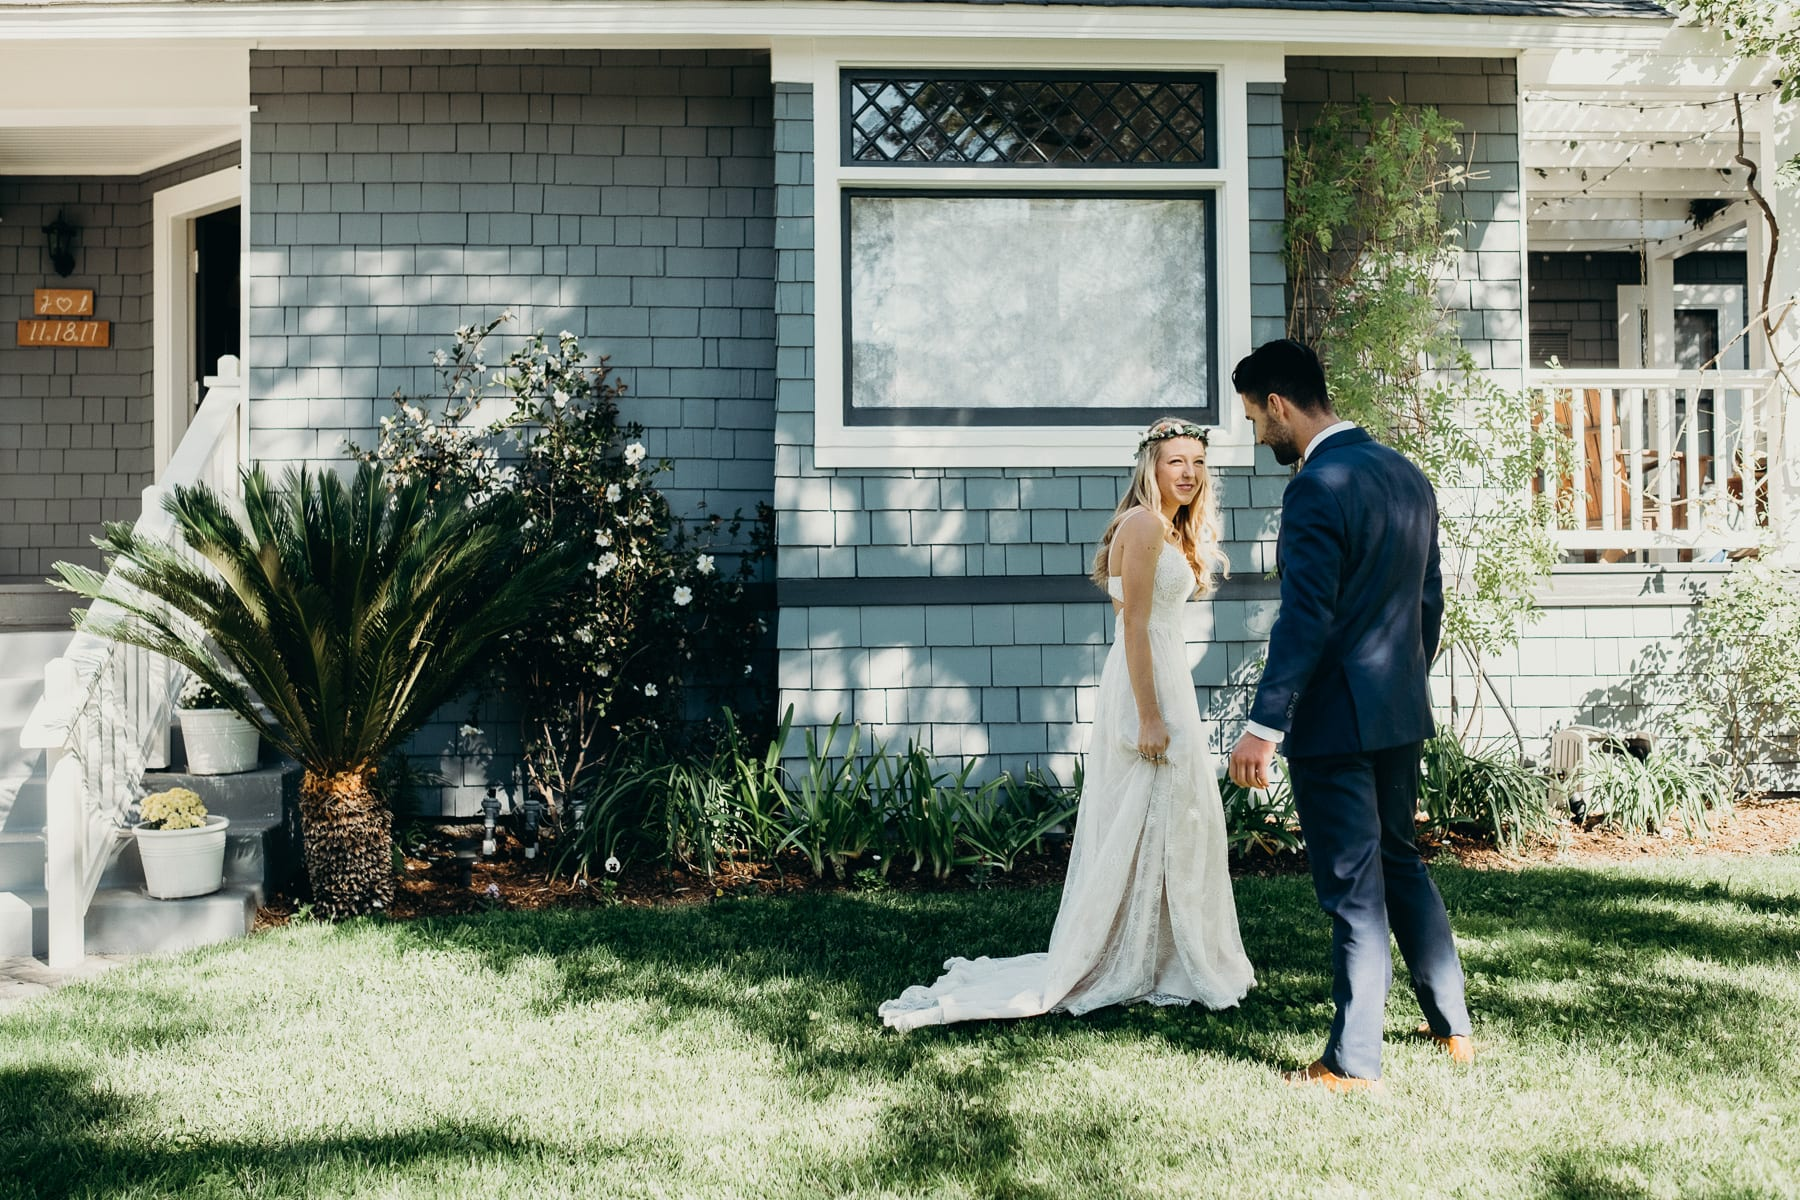 Wedding Photography Pasadena Ca: Pasadena-la-california-backyard-wedding-photographer-30